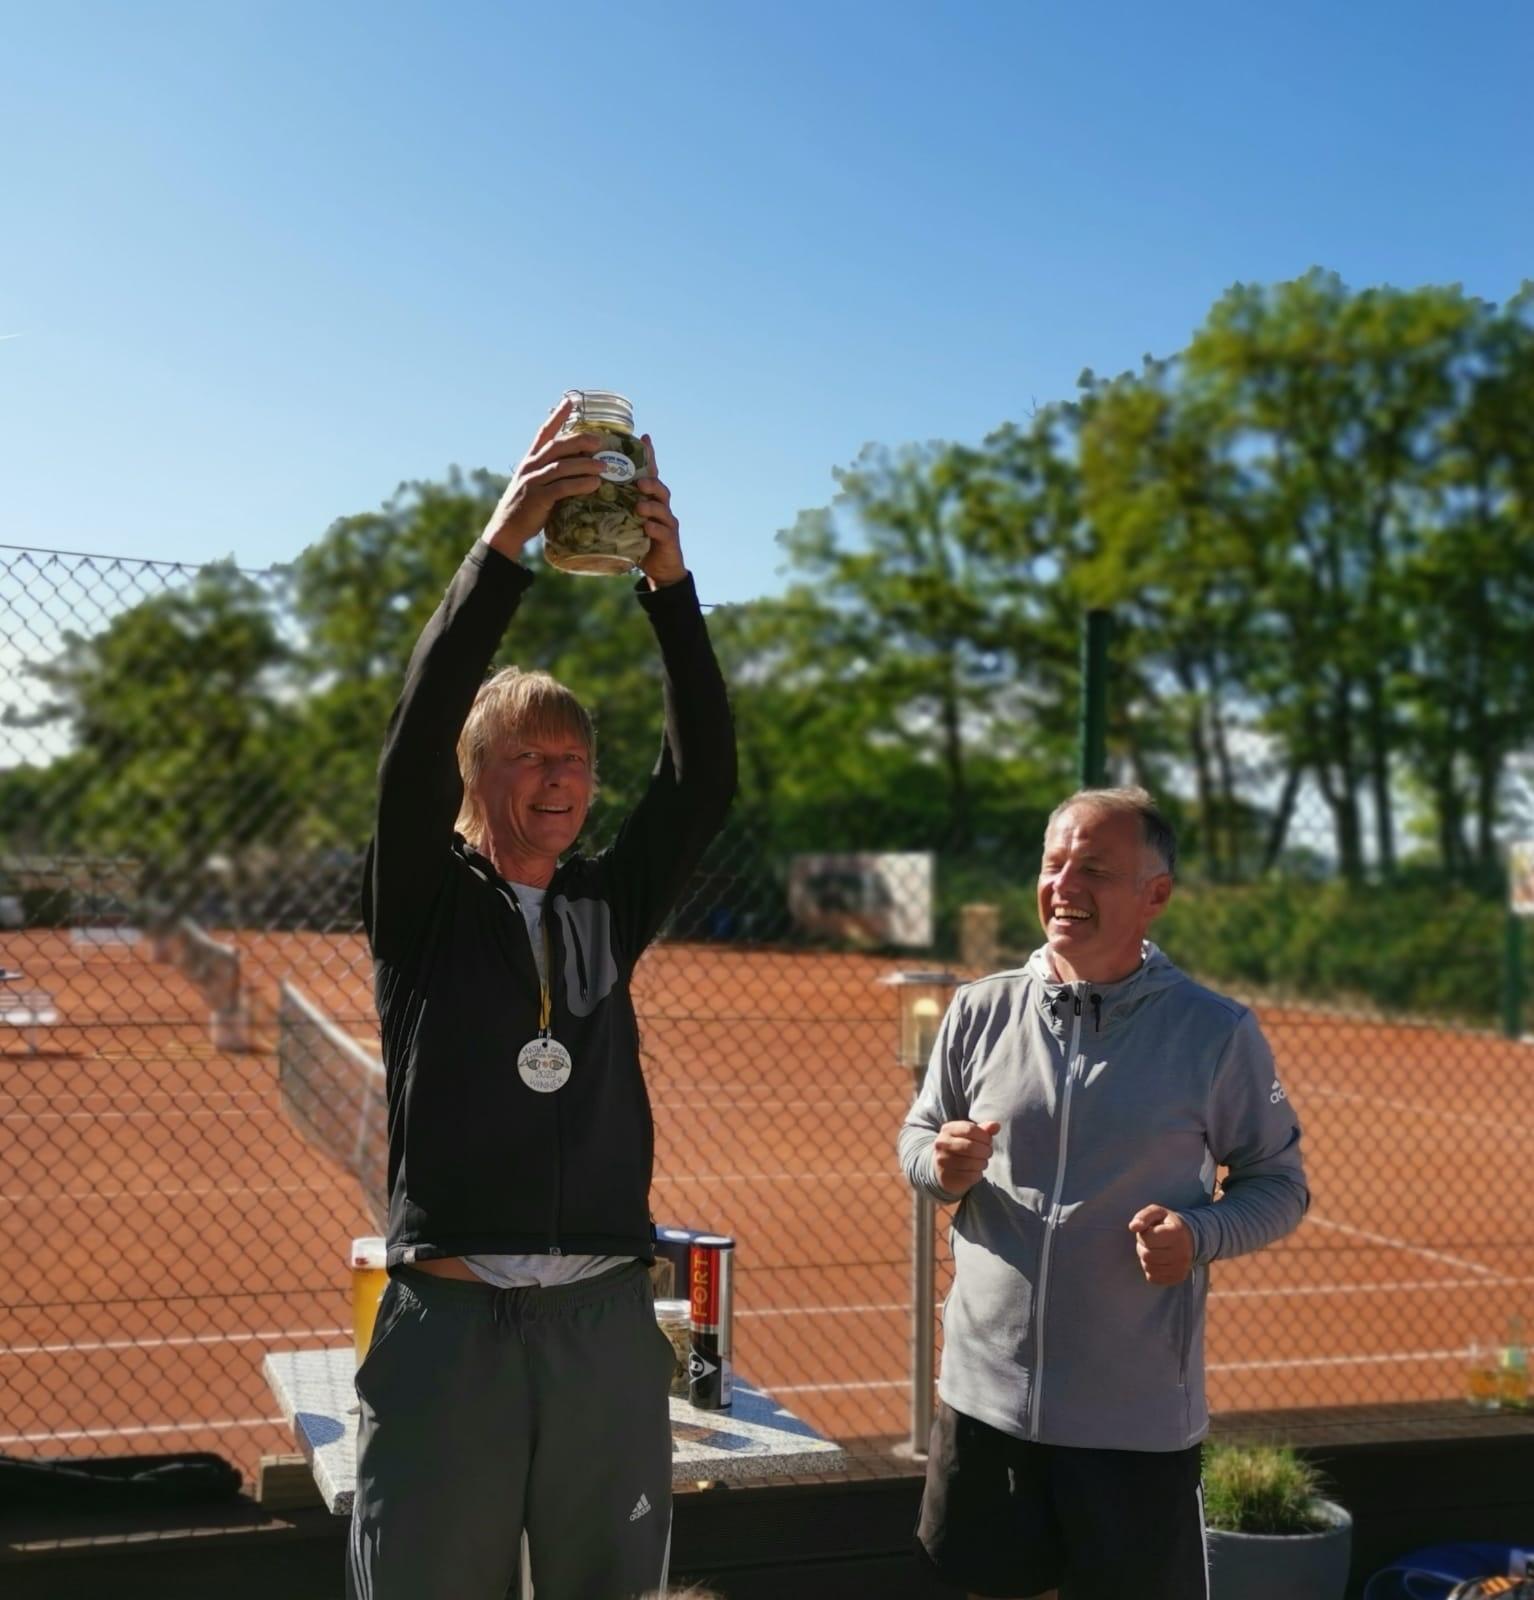 Sieger Jens Kreuzenbeck aus Jüterbog